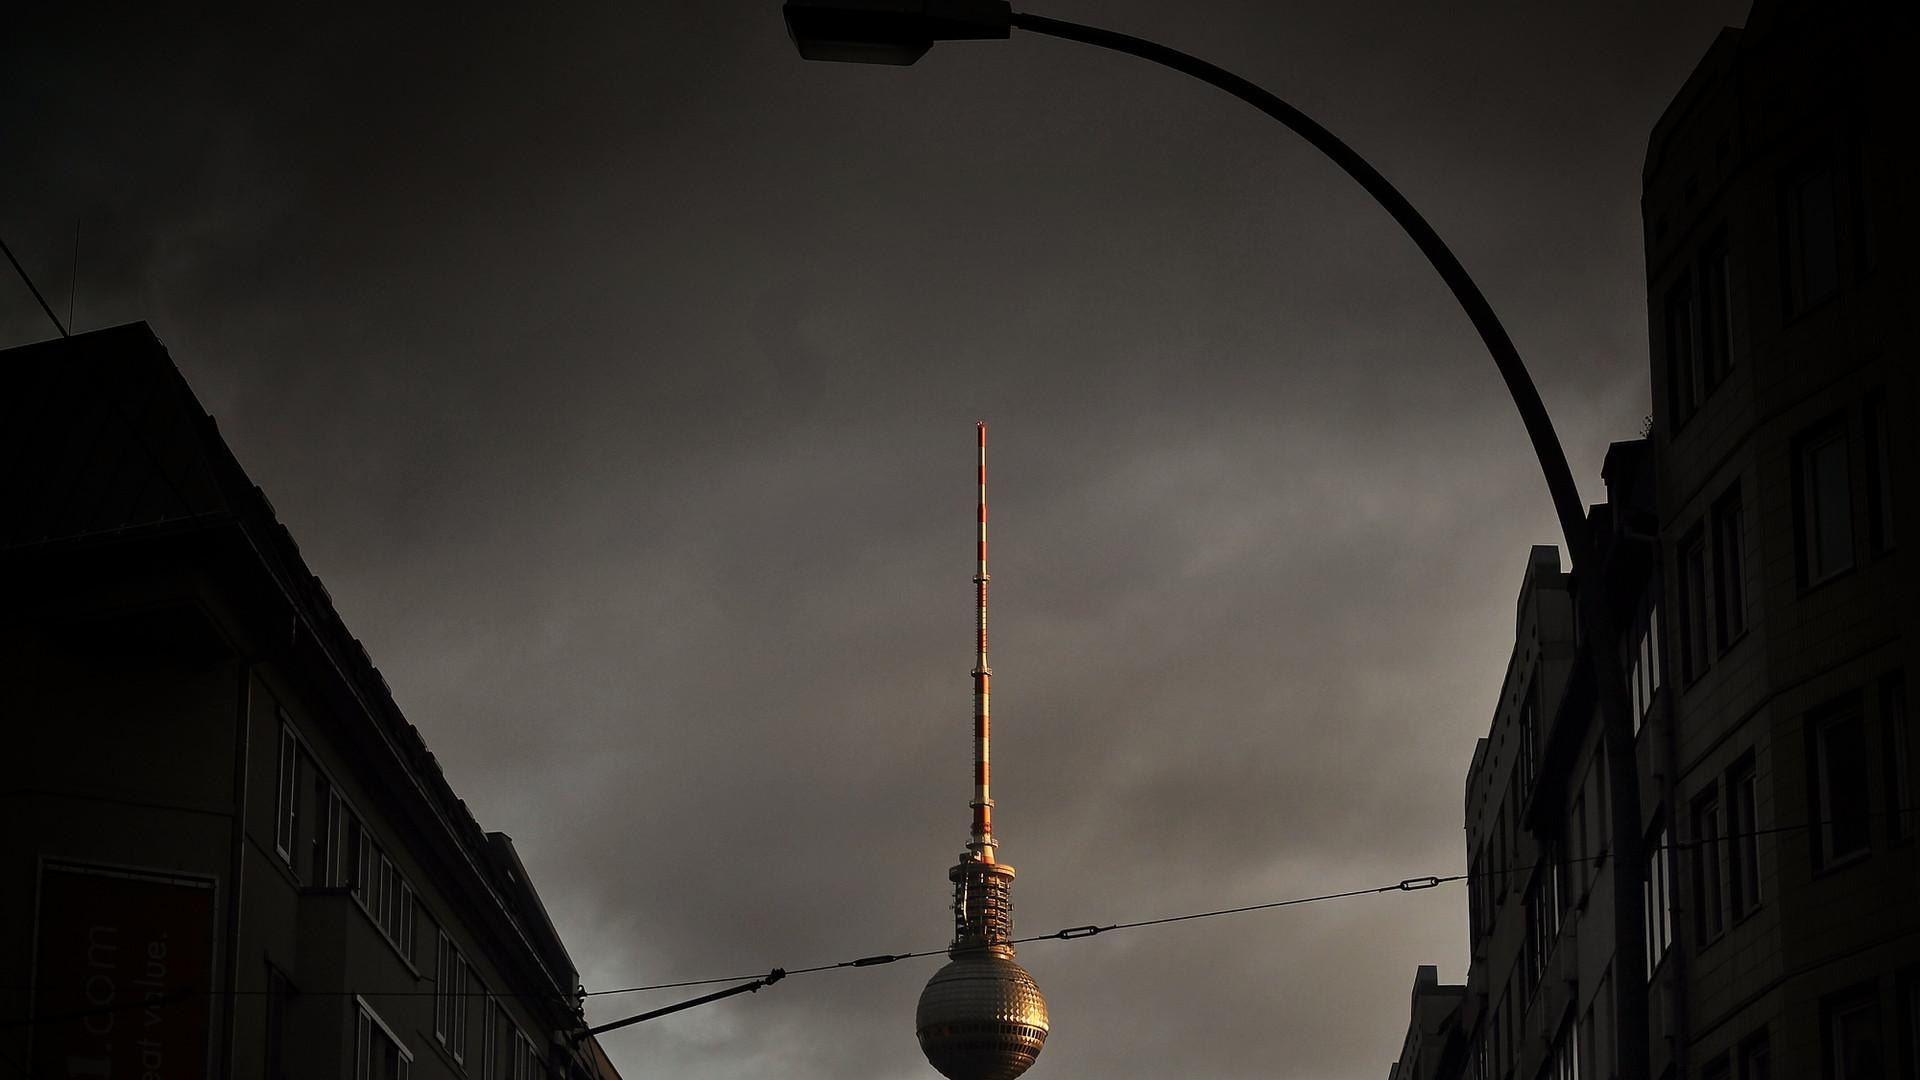 Borkeberlin, Fernsehturm Berlin